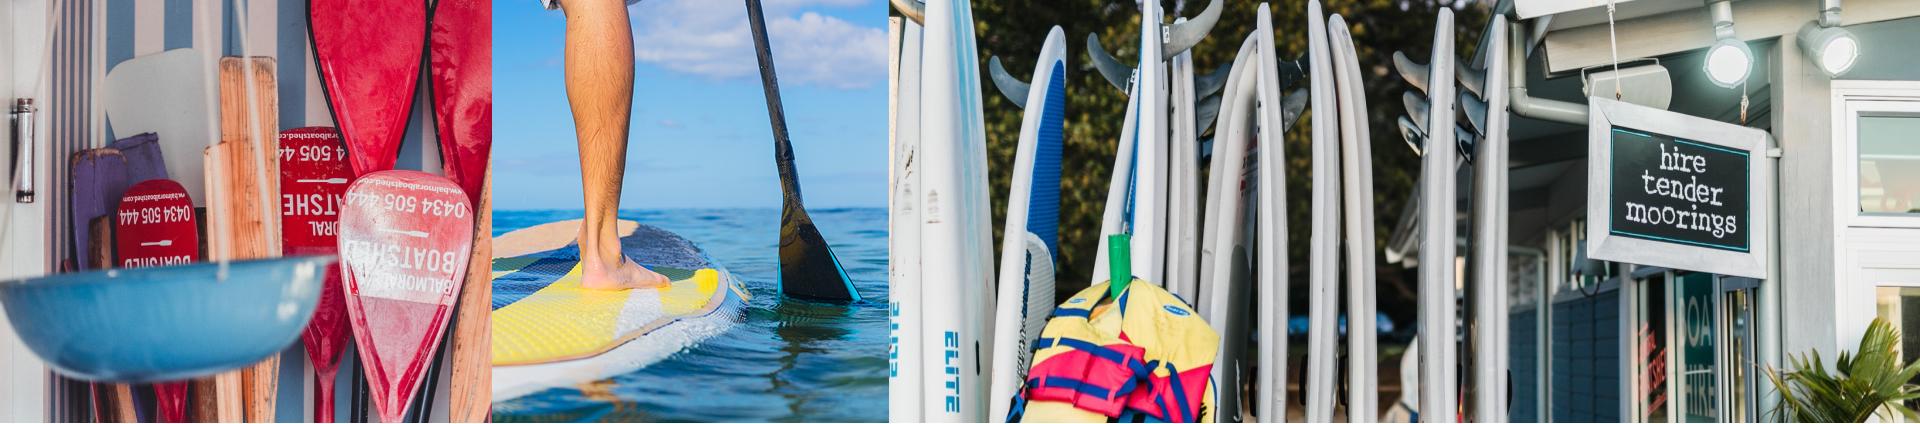 paddboard-hire-sydney-sup-balmoral